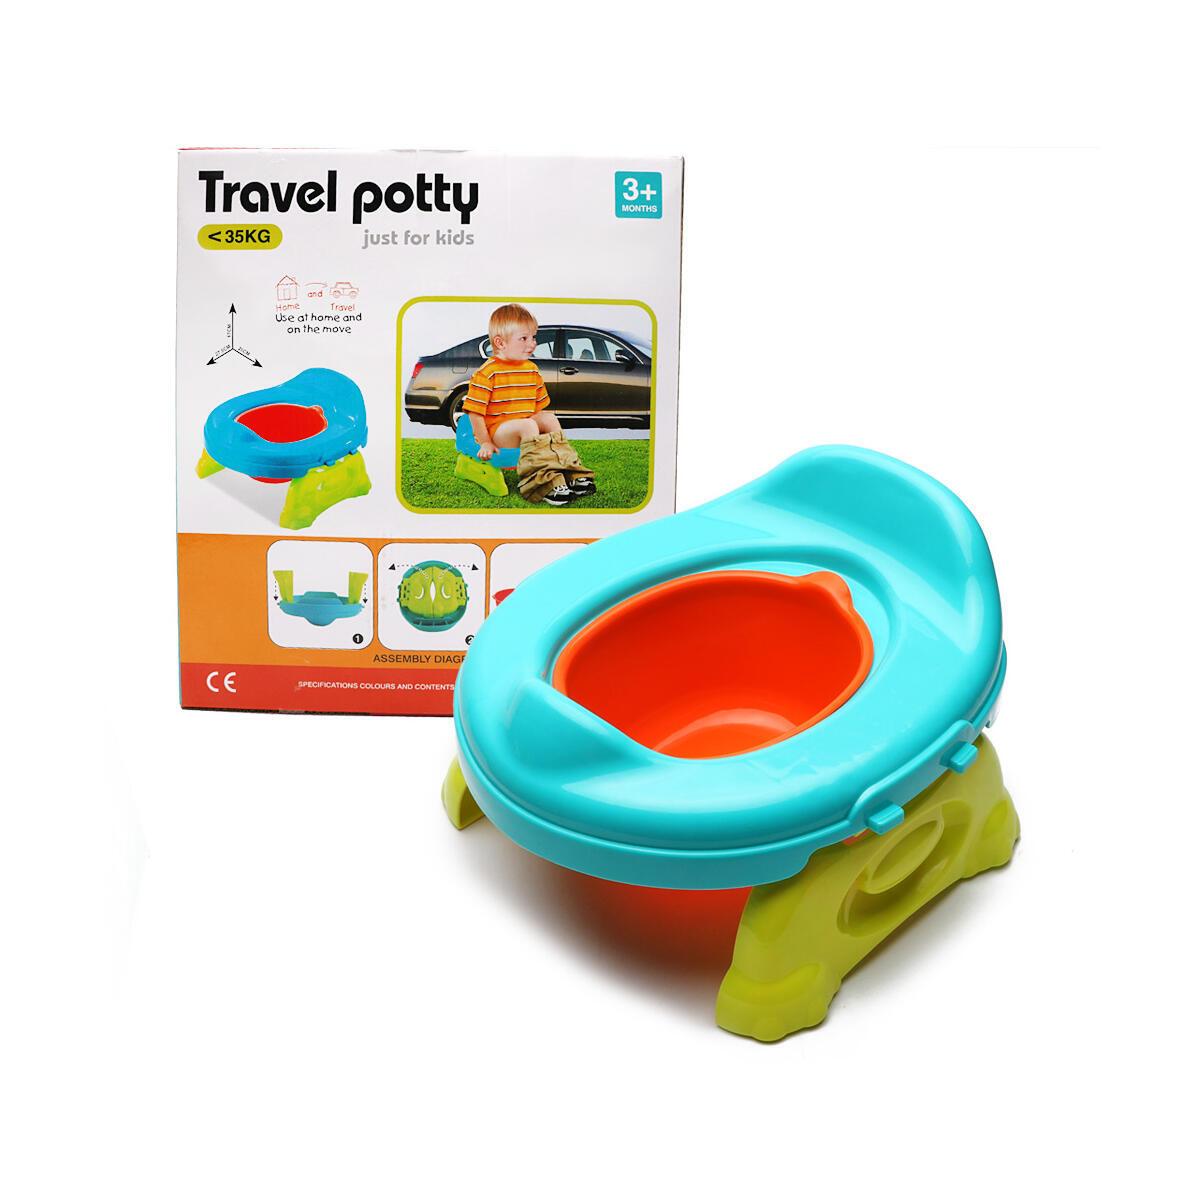 SOWOW Potty Training Seat - 2 in 1 Portable Folding Compact Toilet Seat,Potty Training Toilet Chairs for Toddler Boys & Girls